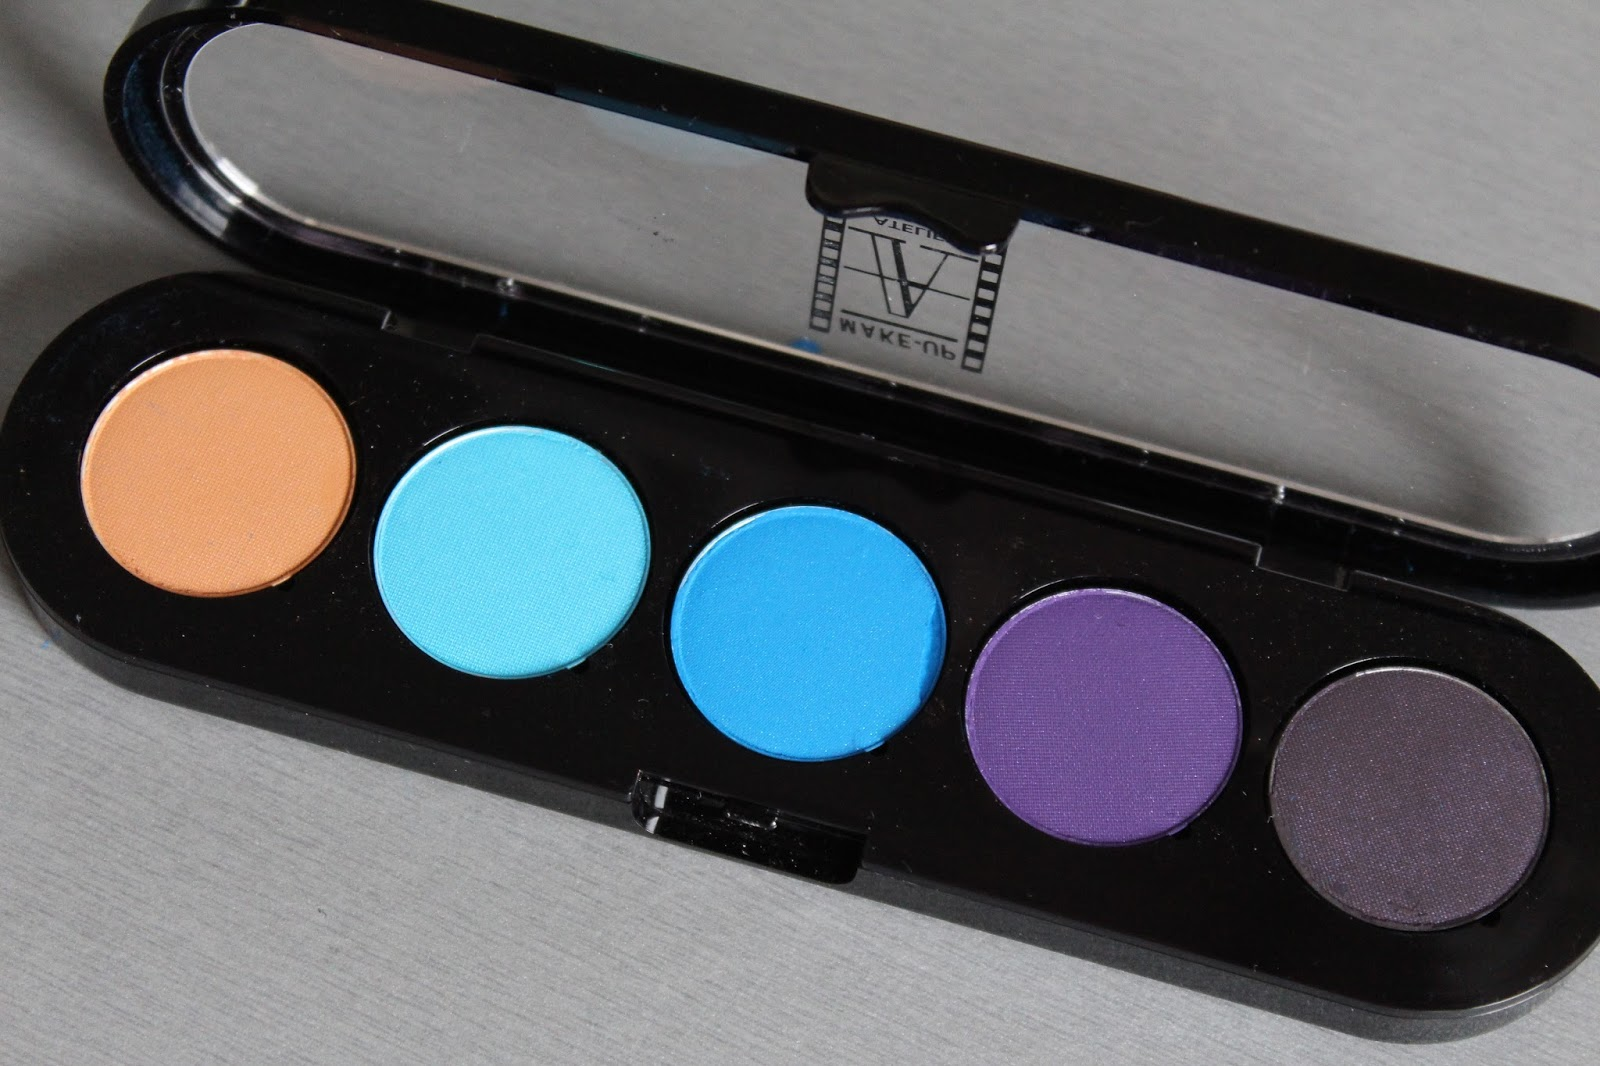 Atelier Make-up paleta sjenila T21